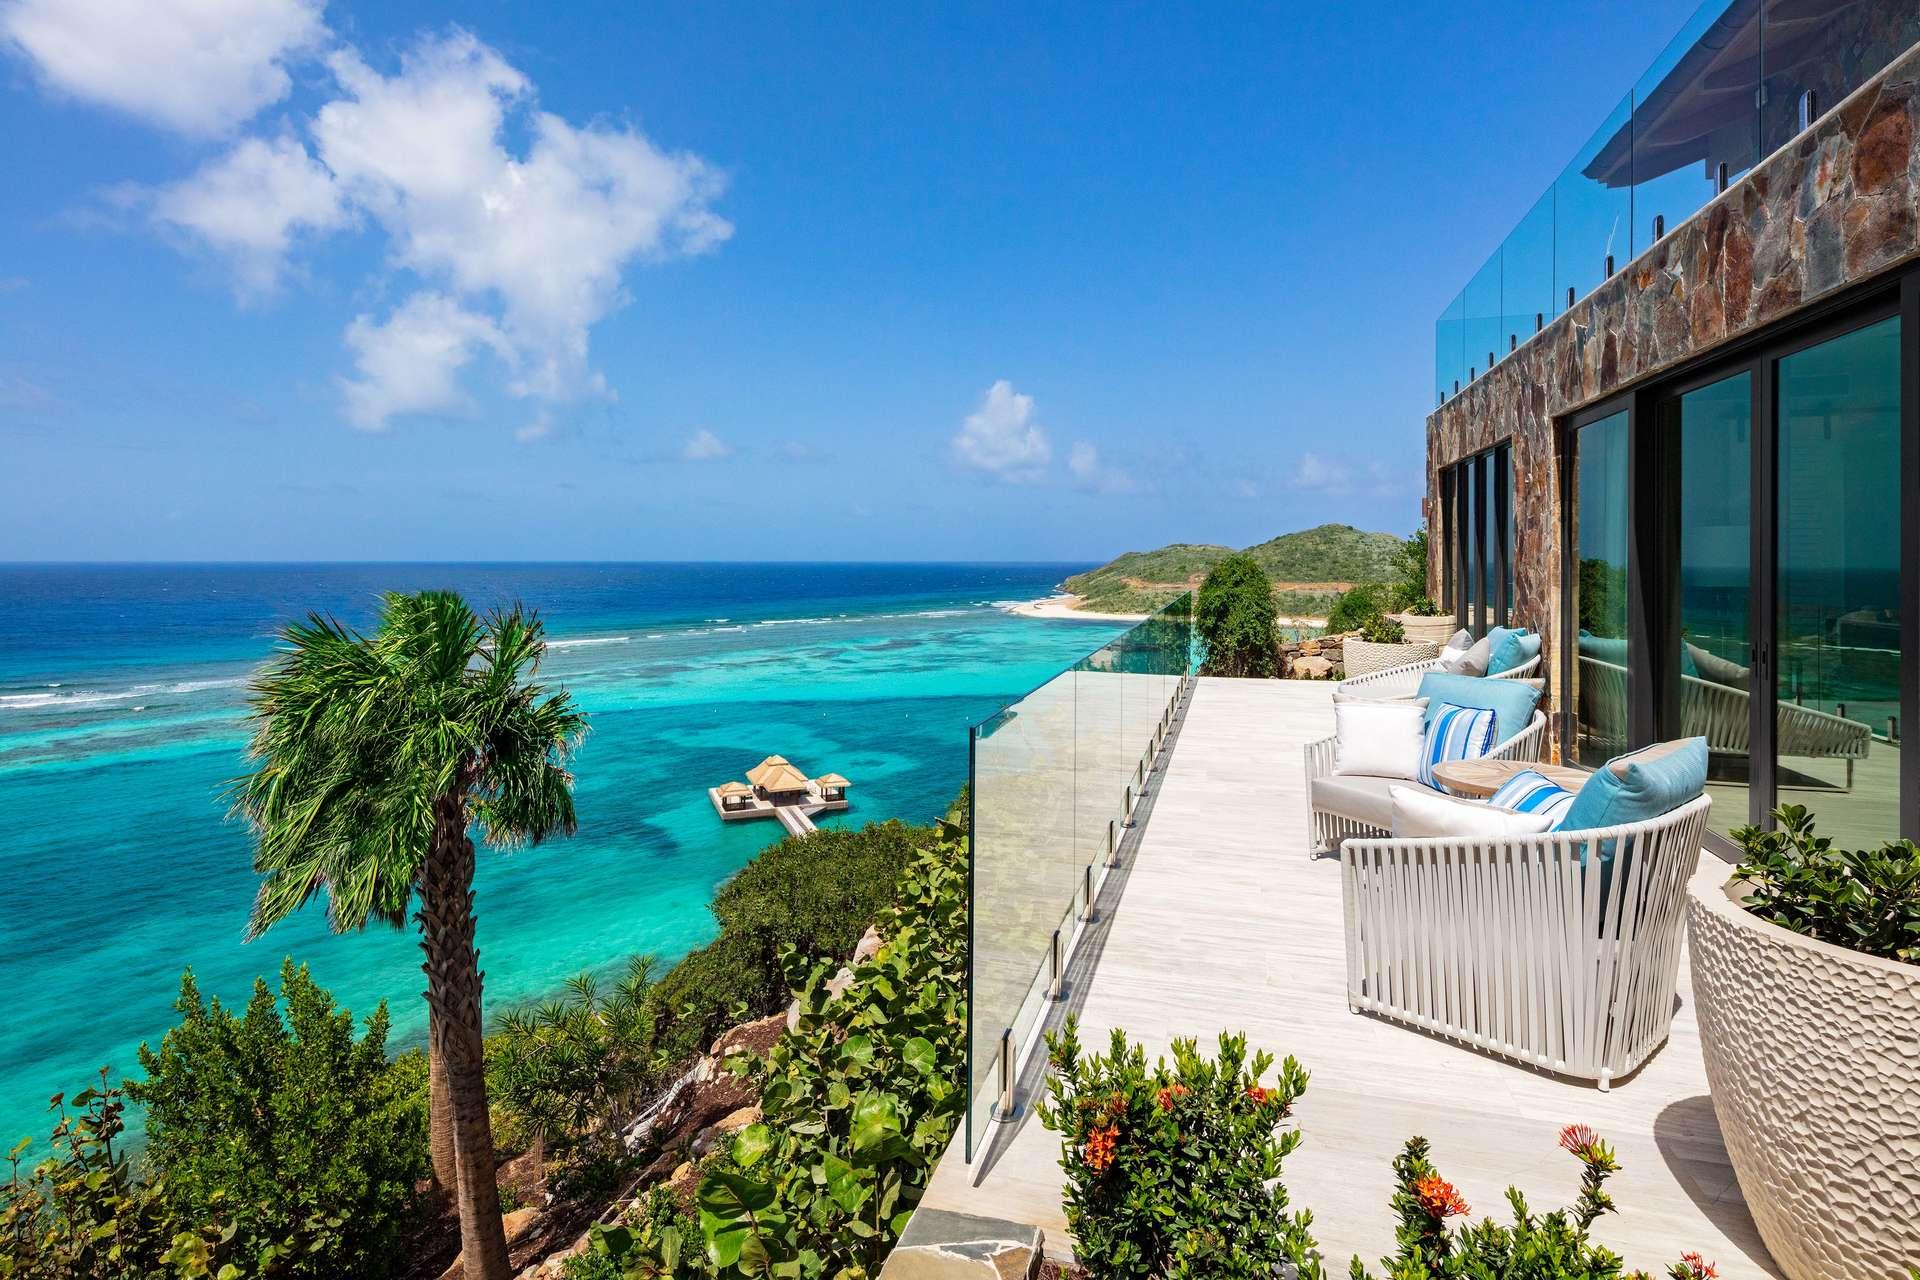 Luxury villa rentals caribbean - British virgin islands - Virgin gorda - Oil nutbay - Maronti - Image 1/15